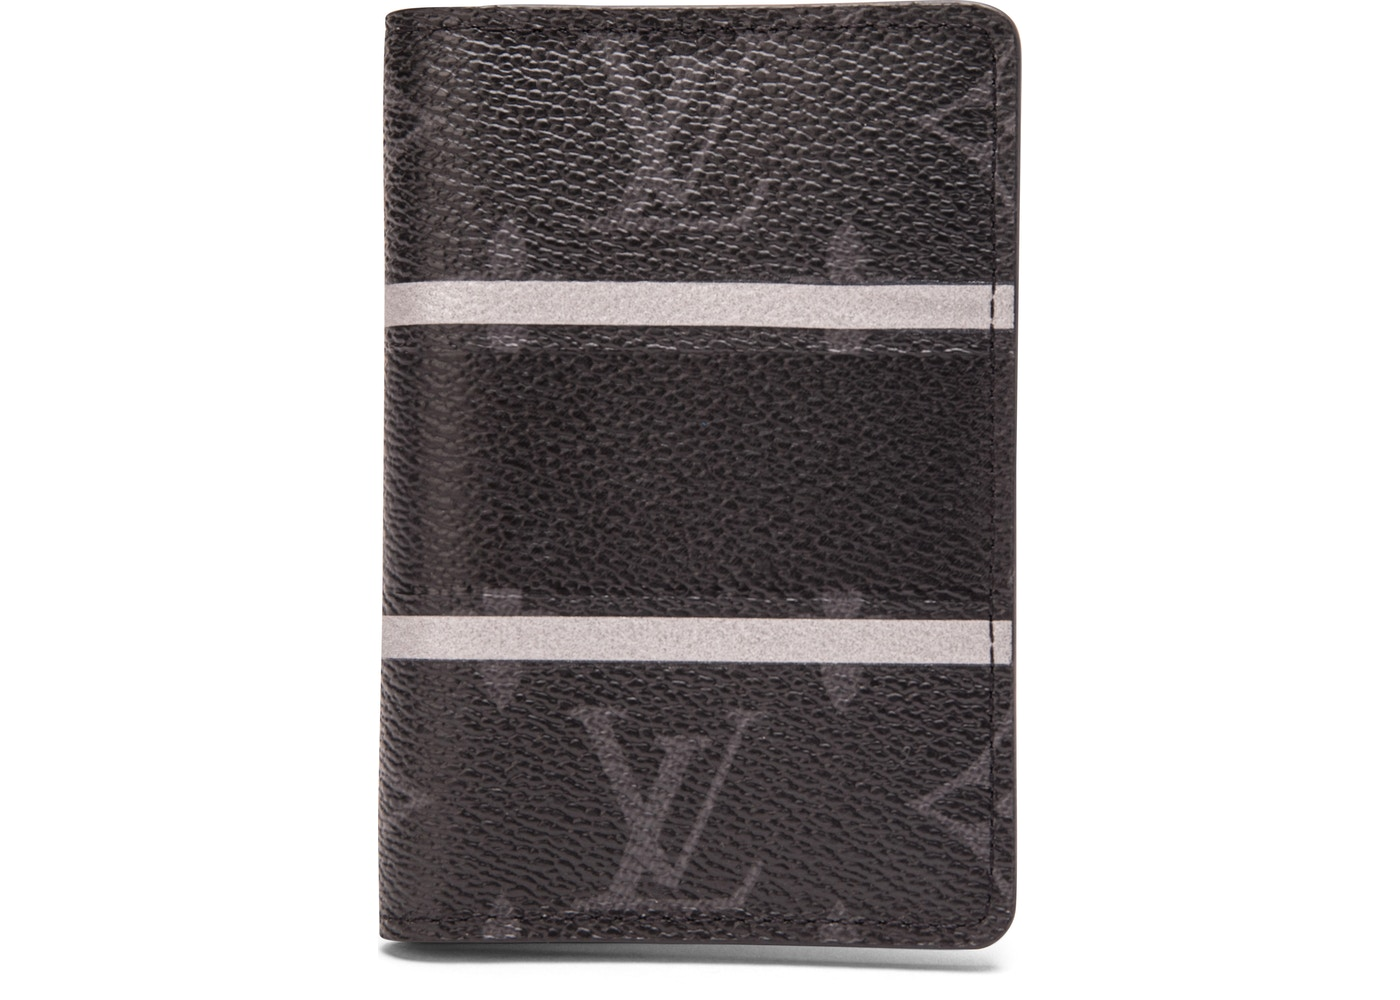 1590e6f6ea8c Louis Vuitton x fragment Pocket Organizer Monogram Eclipse Black. Monogram  Eclipse Black